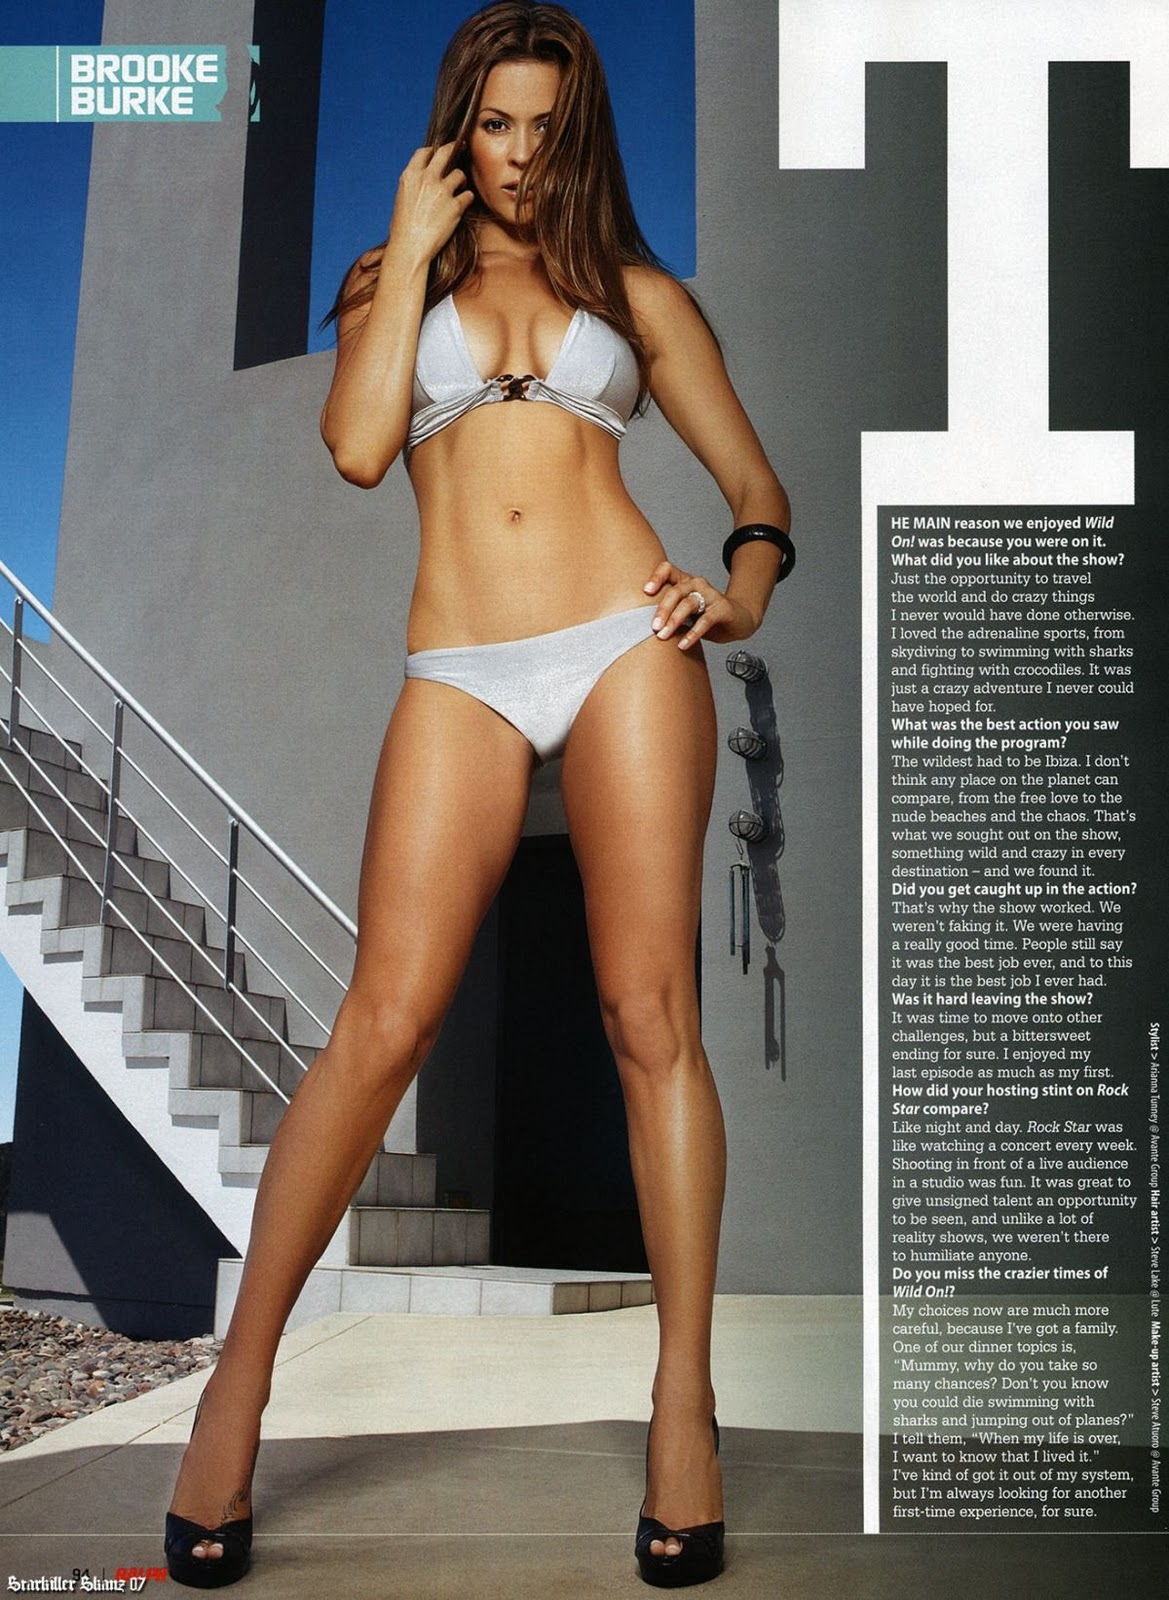 Celebrity Photoshoots: Brooke Burke Bikini Pictures from ...